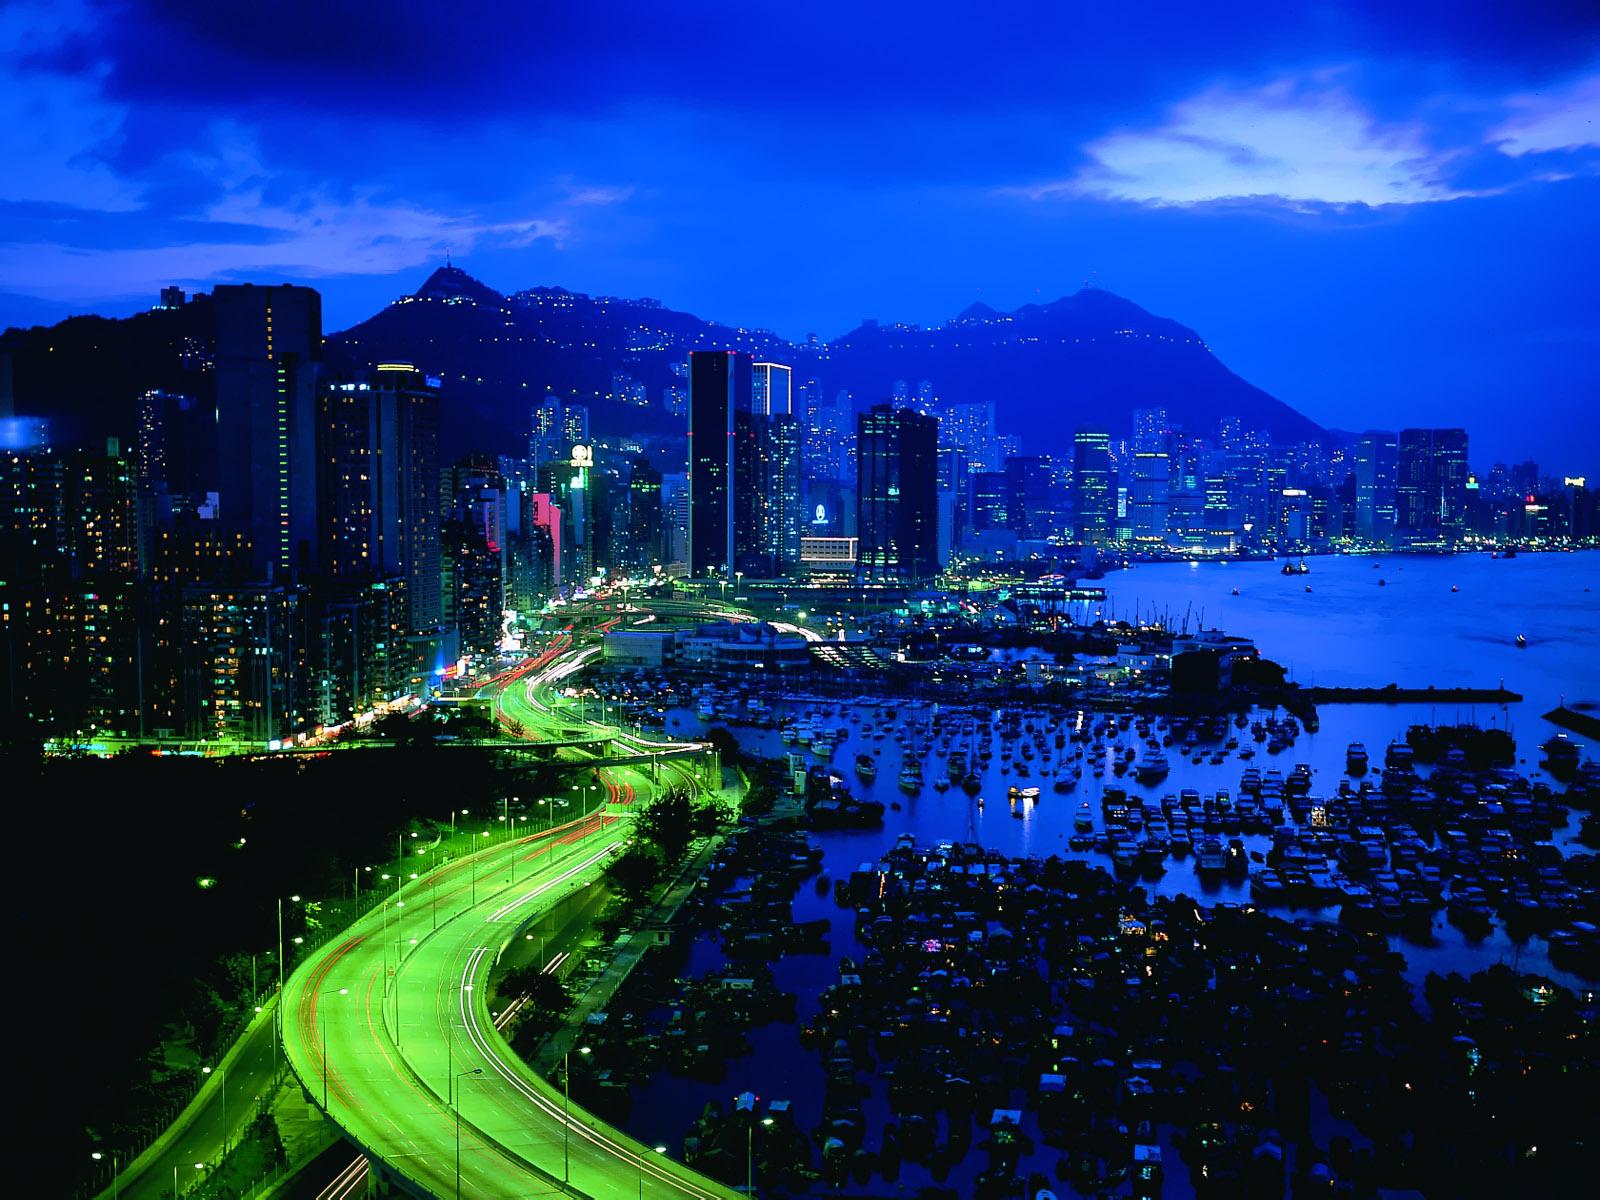 Night City Lights - HD Wallpapers - Techdude1987's blog